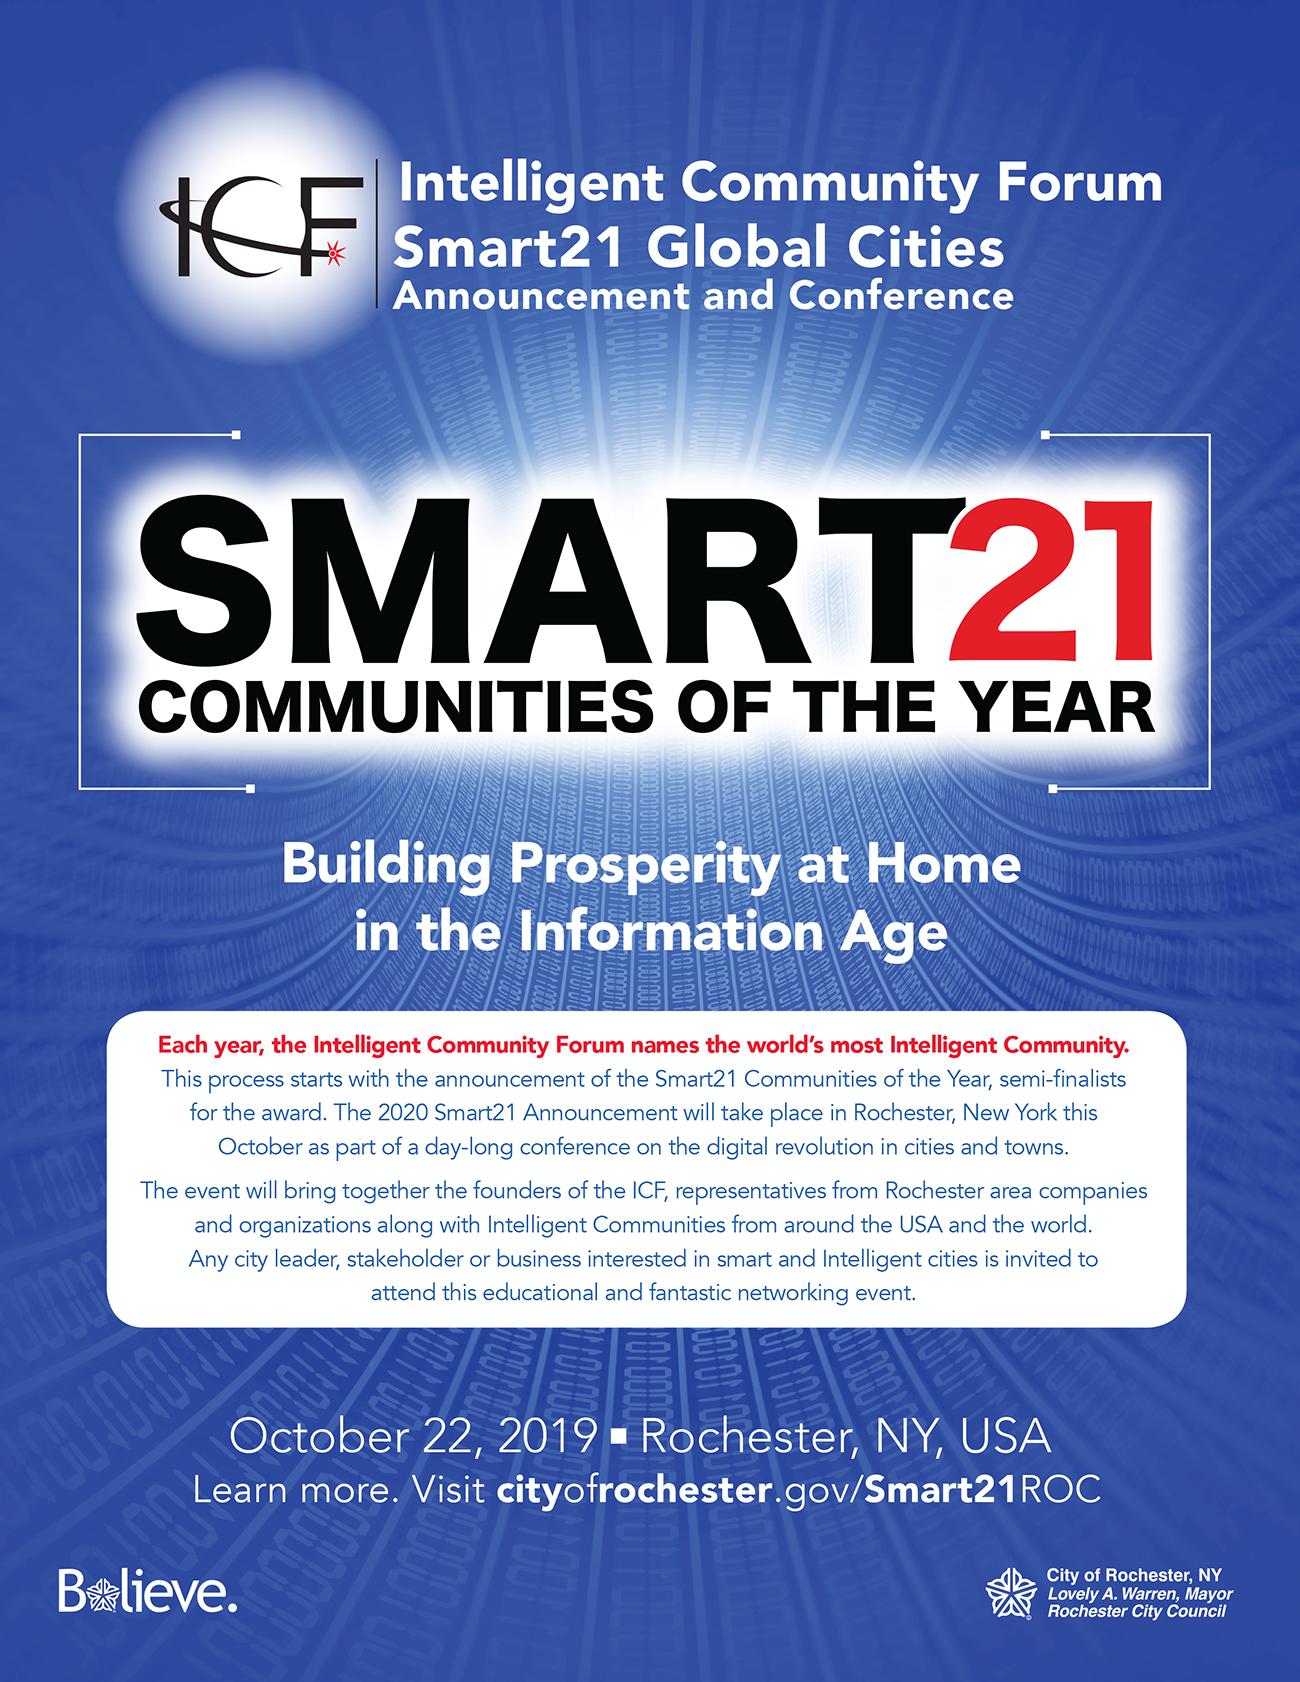 19_IT_flier_Smart21_event.png